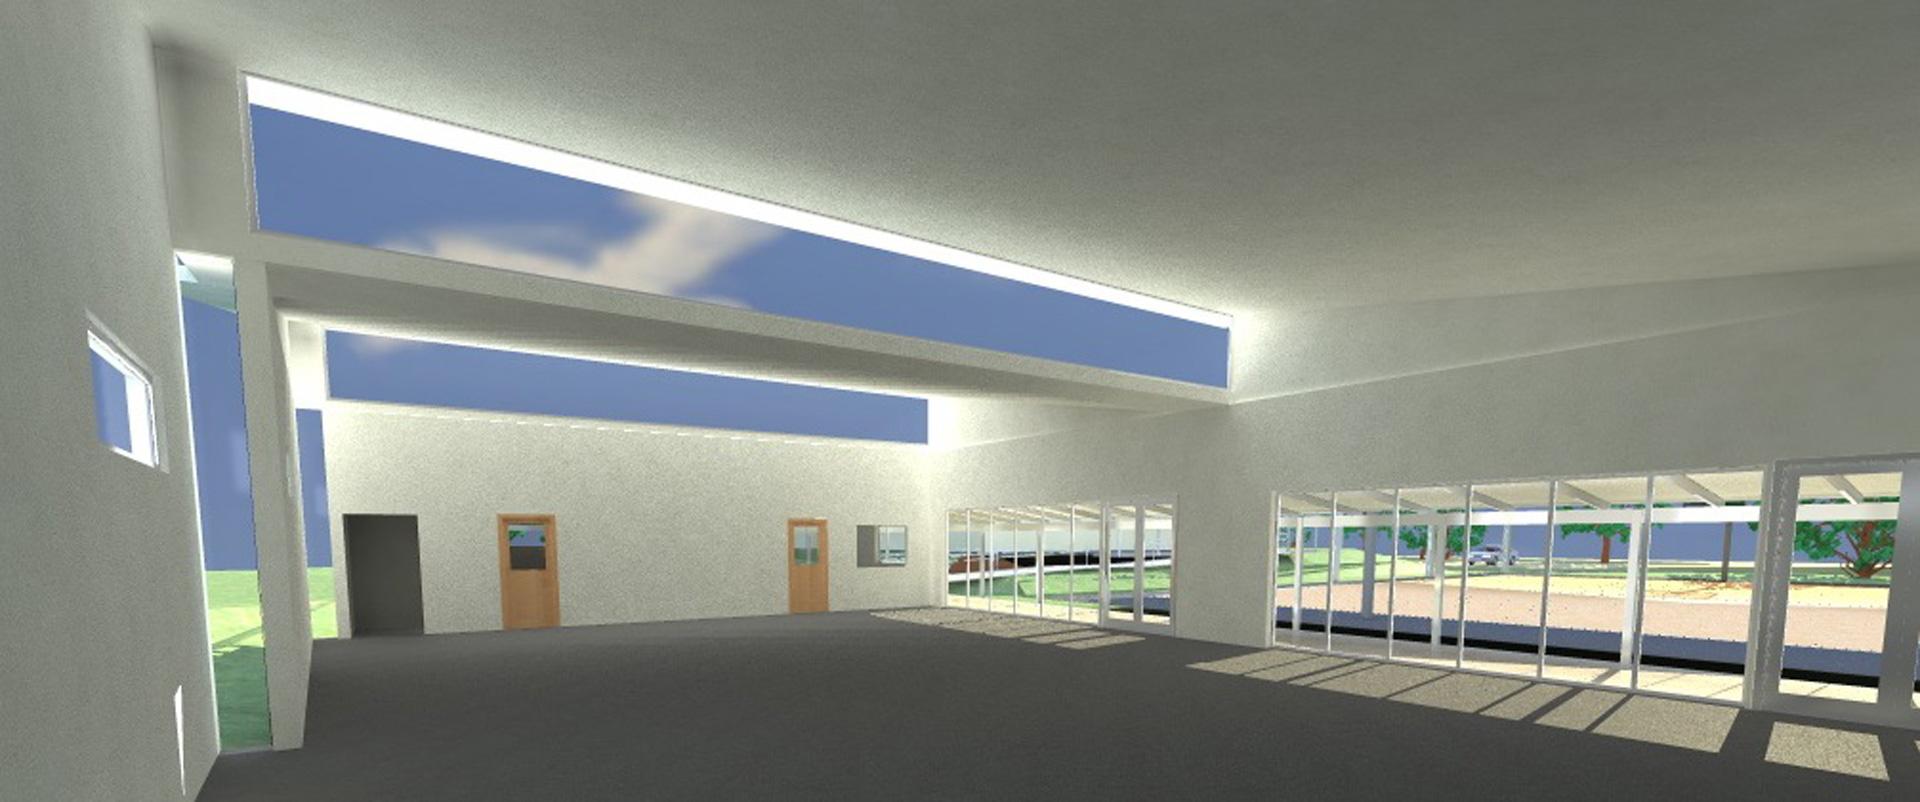 Montessori-Interior